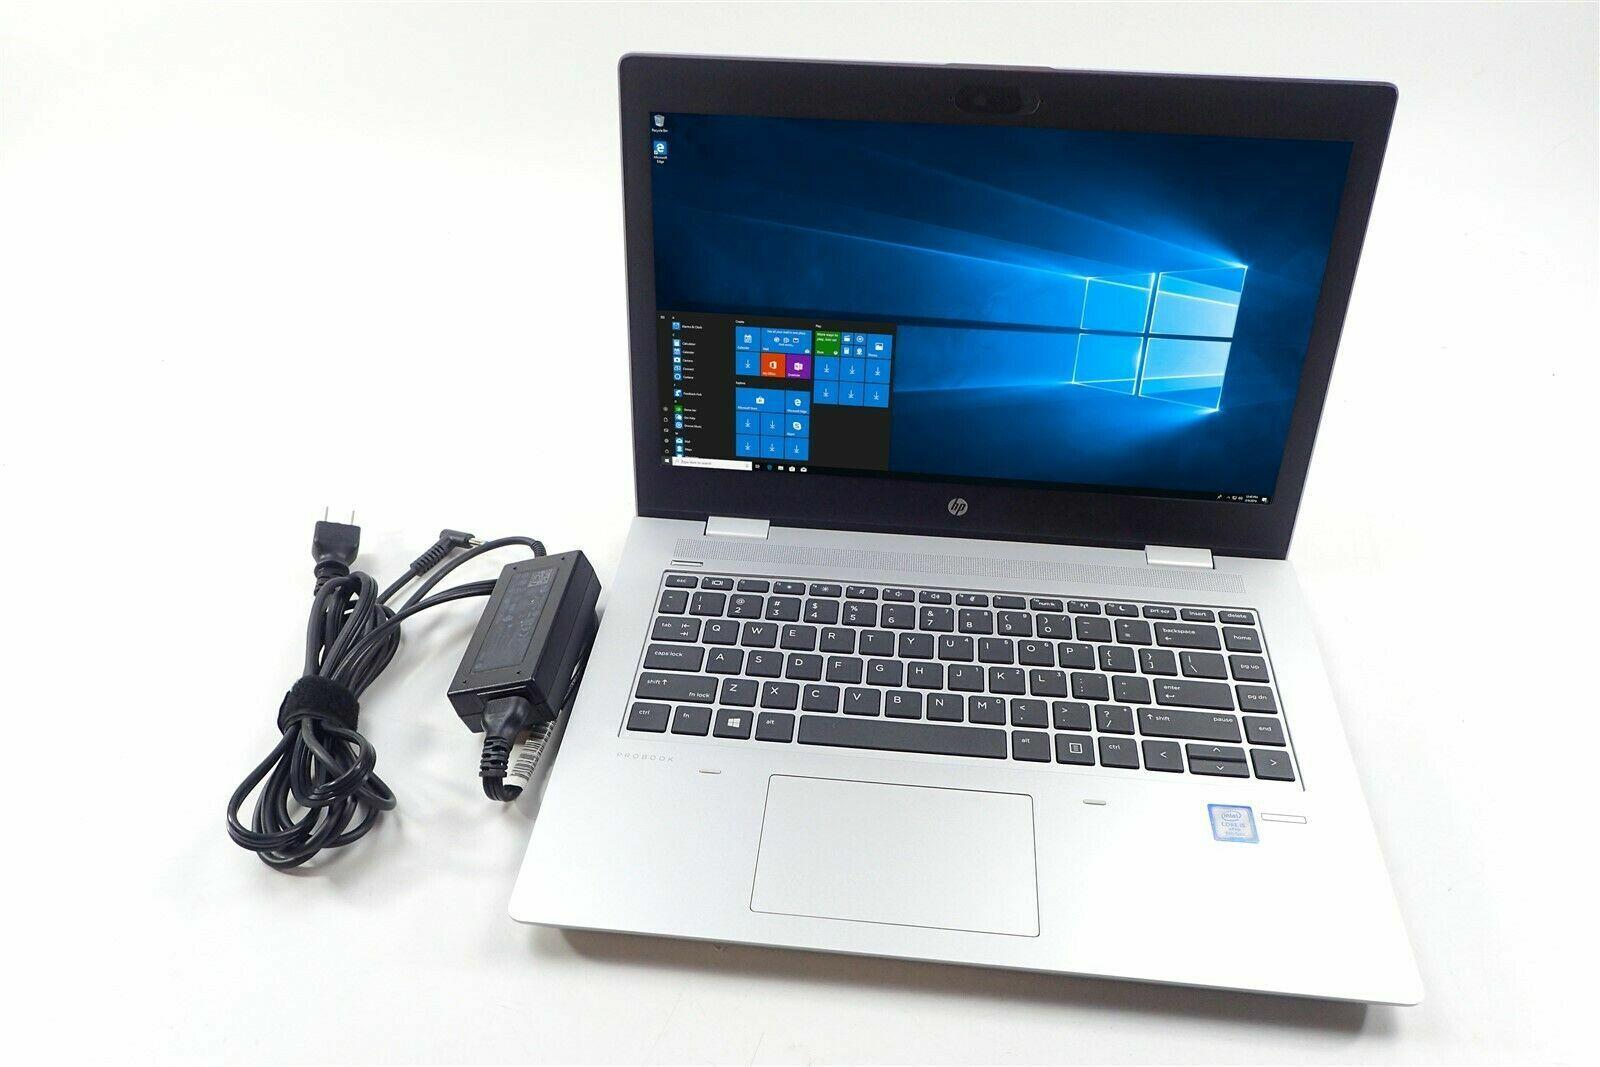 HP ProBook 640 G4 Laptop 14 LCD Intel I3-8130U 2.20Ghz 8GB 1TB HDD WIFI/BT W10P - $202.50